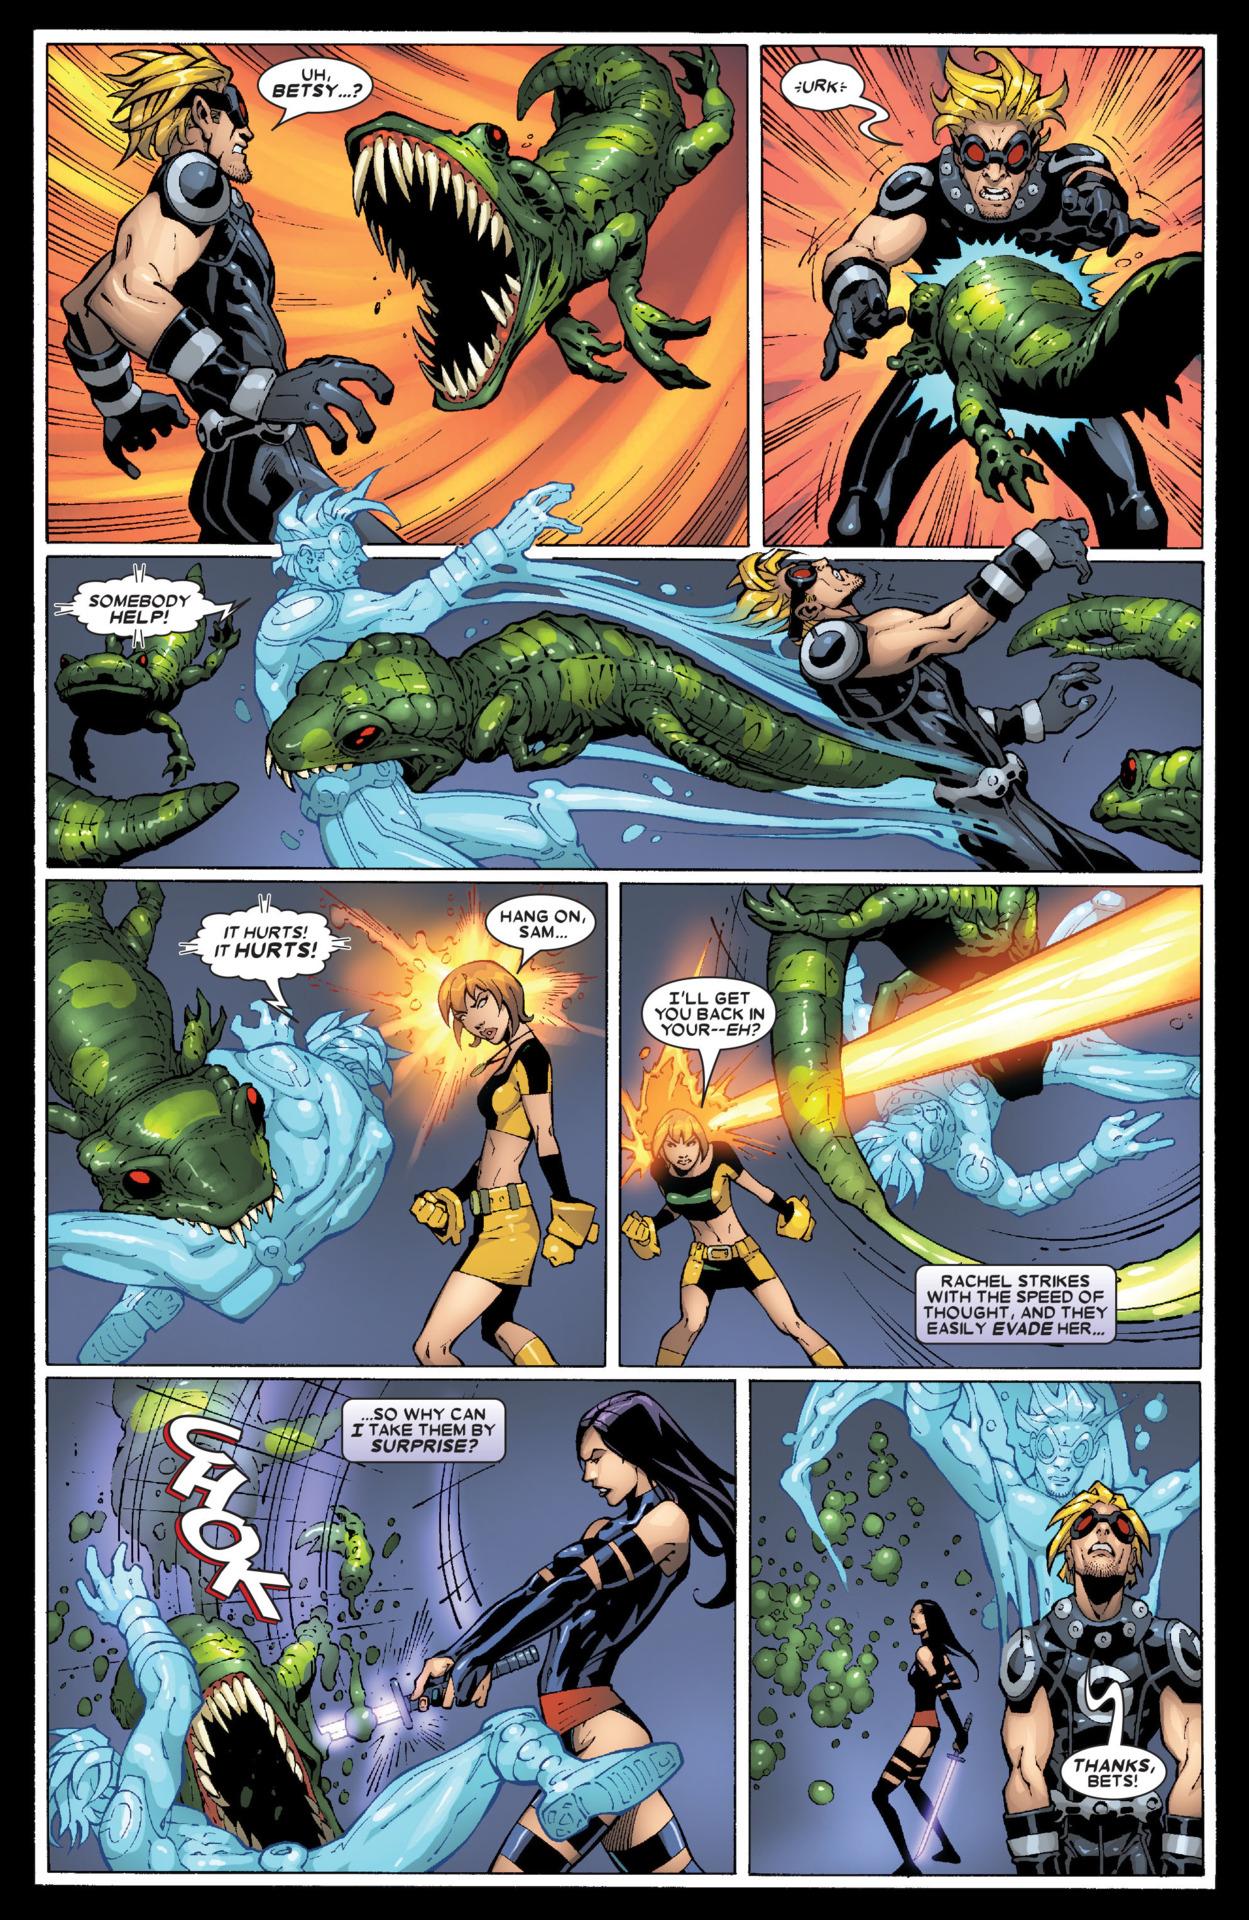 Psylocke says that Rachel attacks at the speed of light- Uncanny X-Men v1 #473